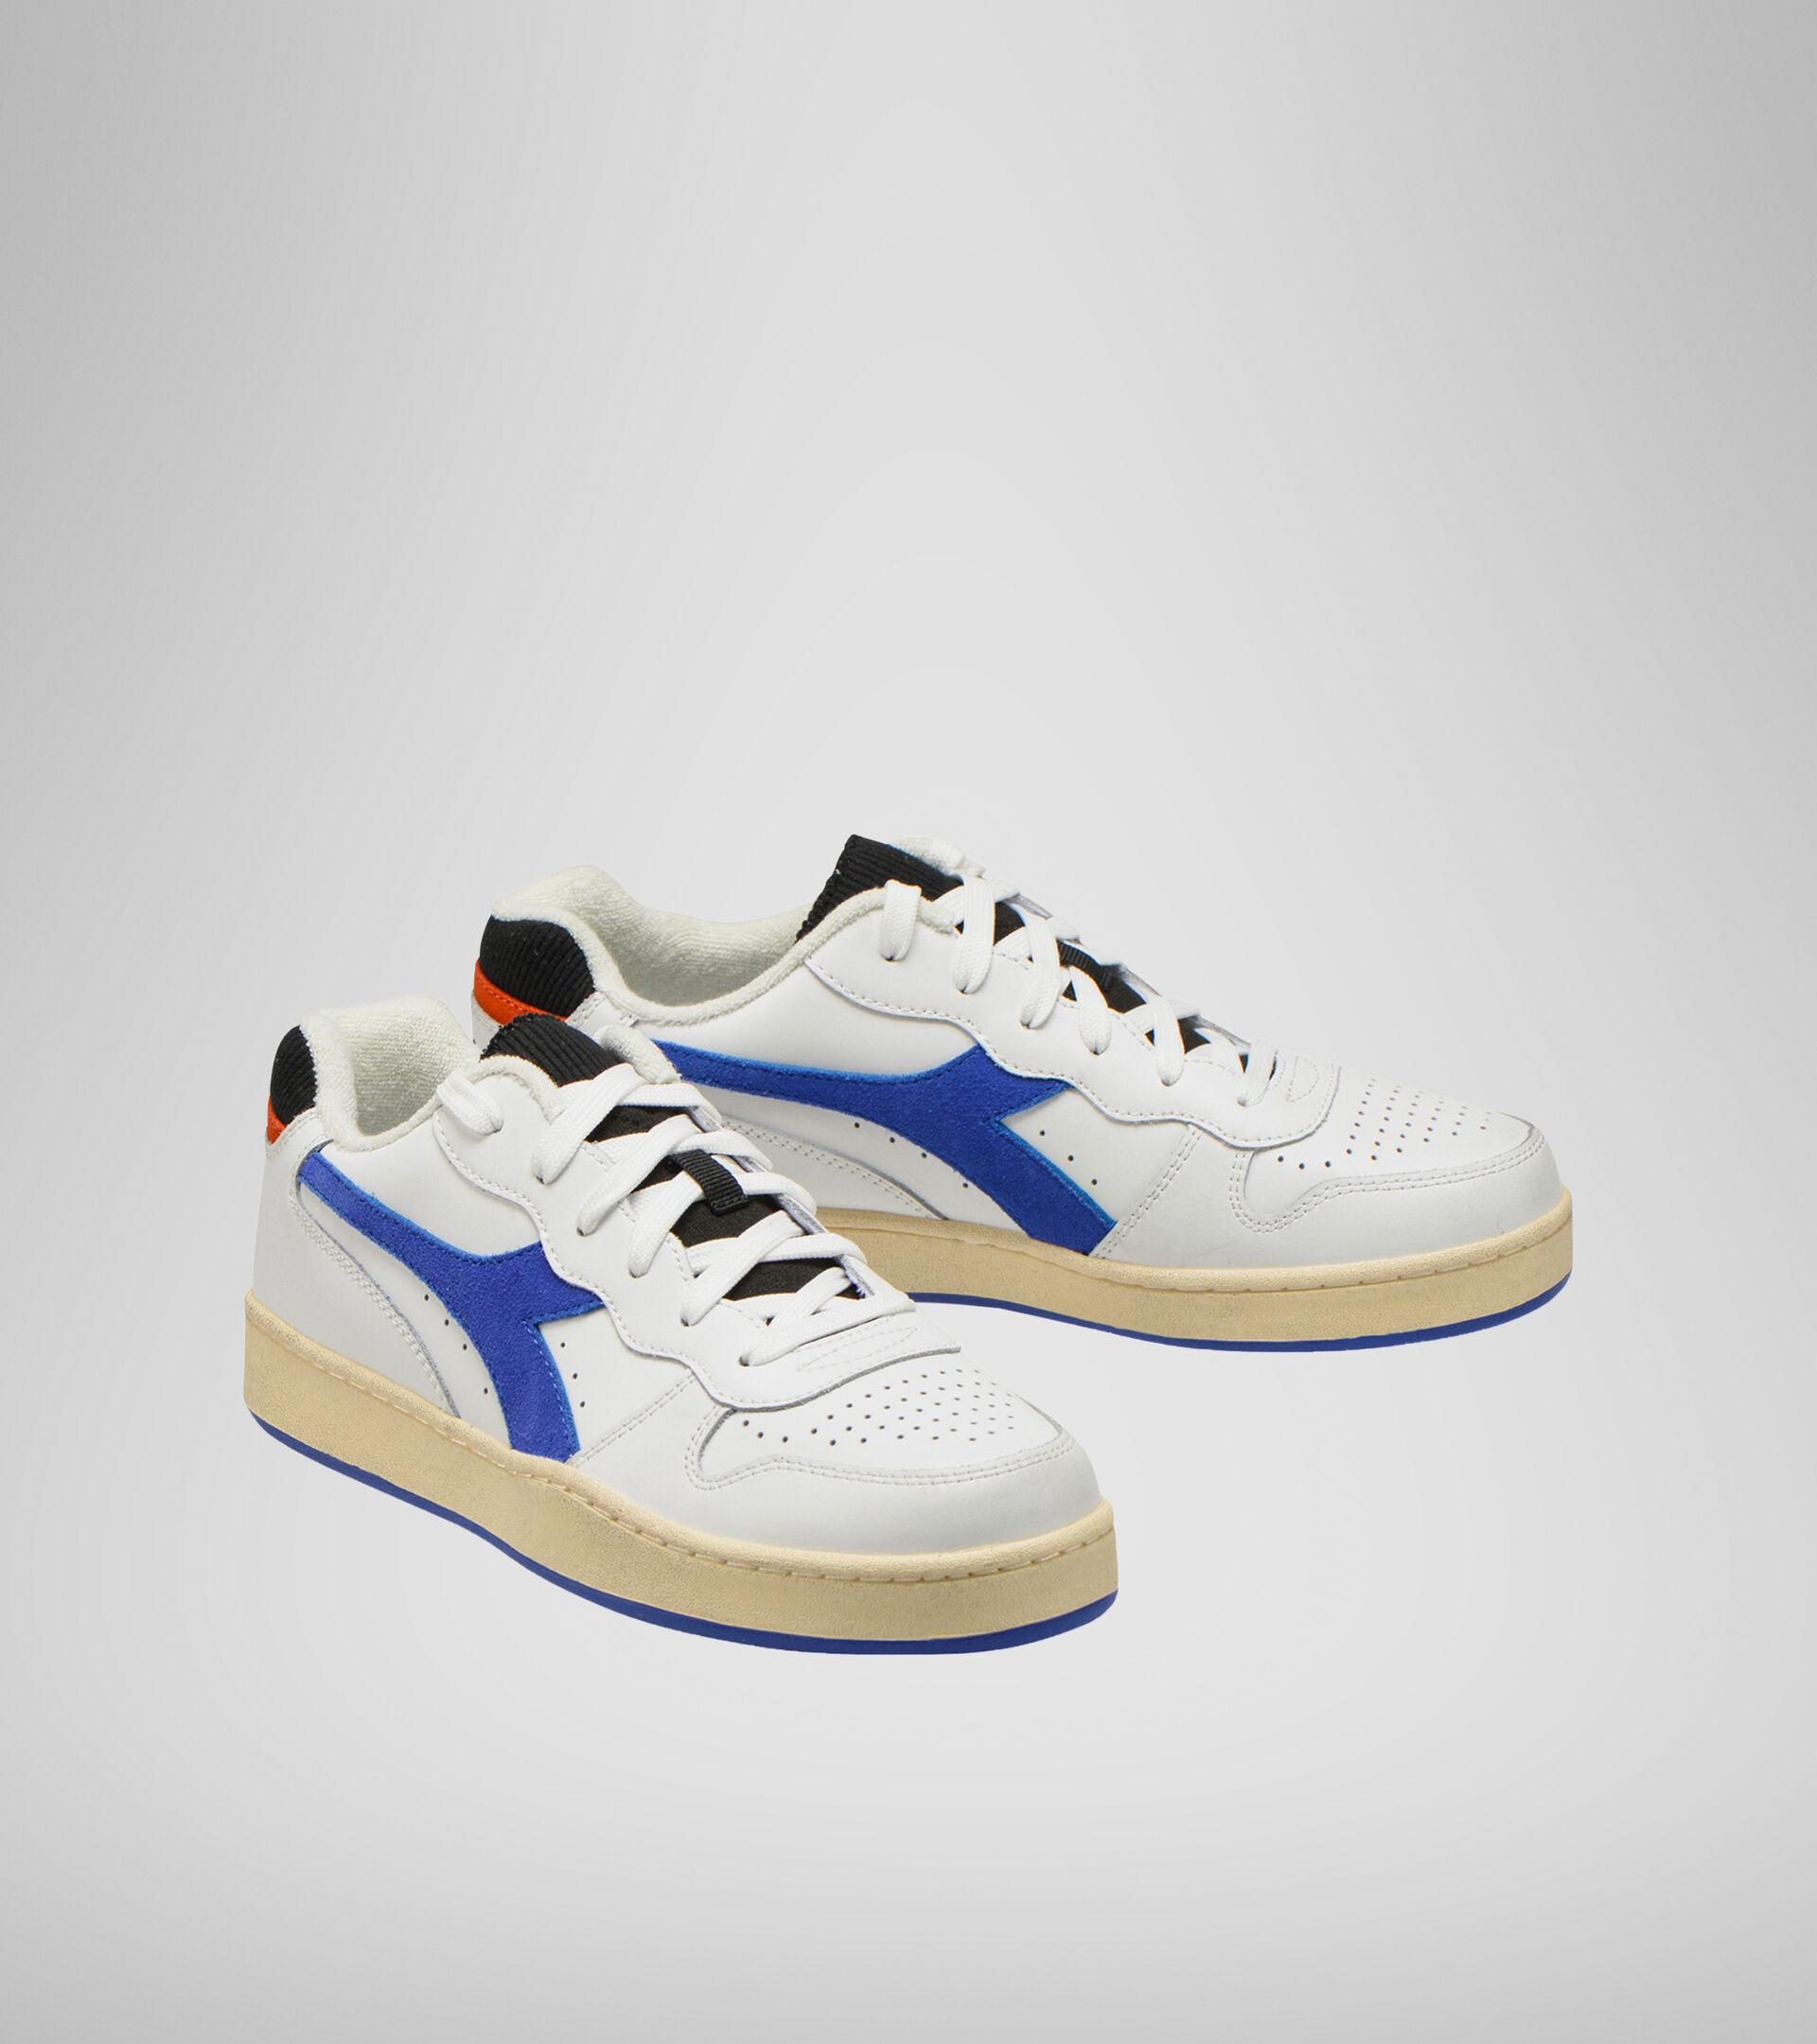 Footwear Sportswear UNISEX MI BASKET LOW ICONA WHITE/AMPARO BLUE/ORANGEADE Diadora